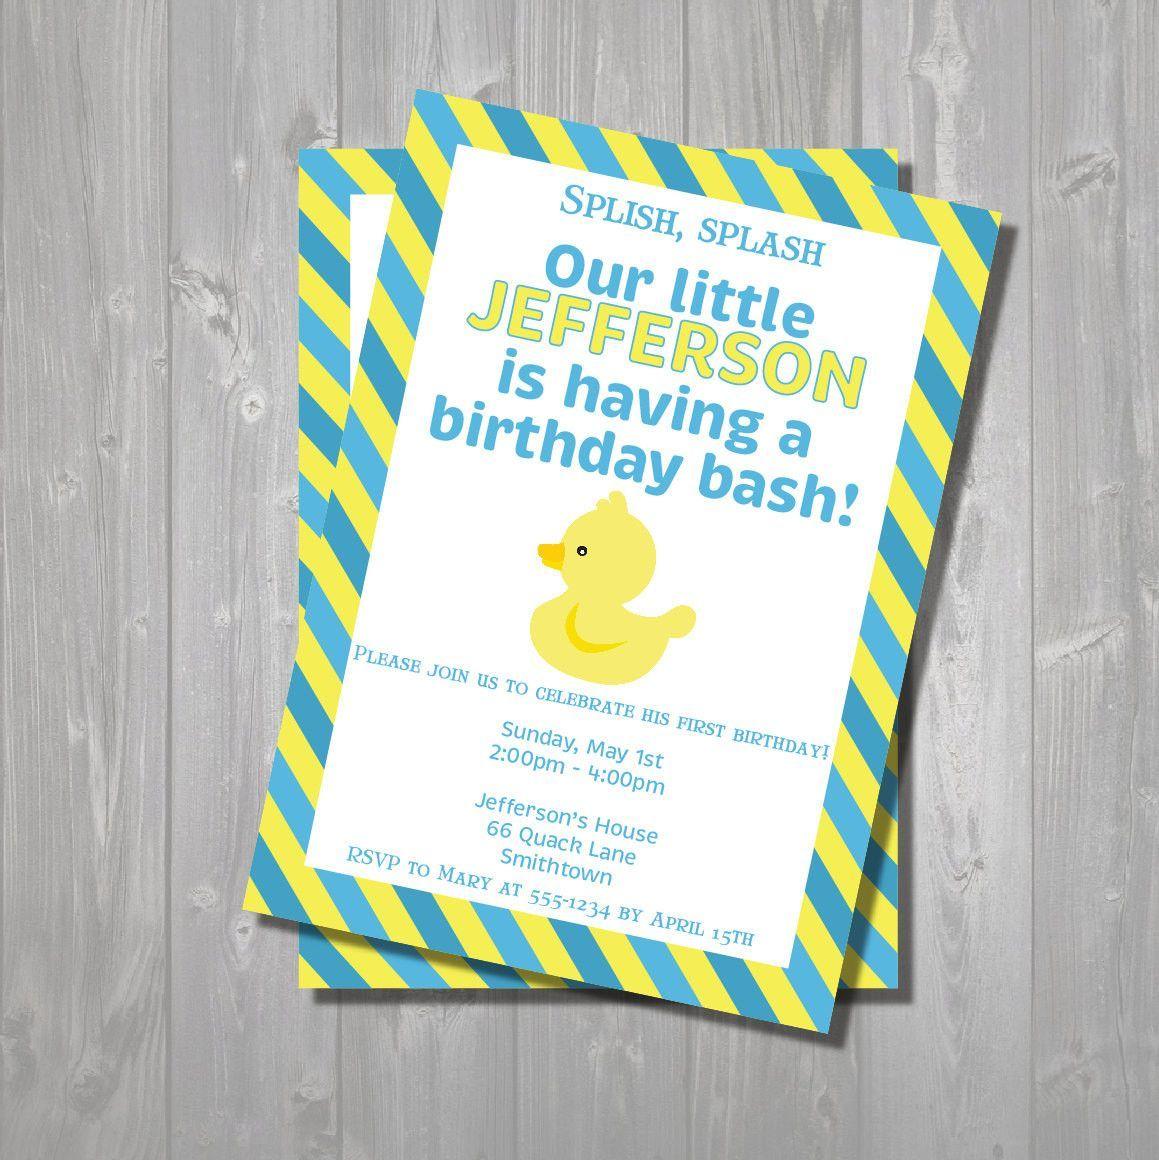 Rubber Duck Birthday Party Invitation Yellow Duck Invitation Digital Printable Invite Rubbe Rubber Duck Birthday Duck Birthday Birthday Party Invitations